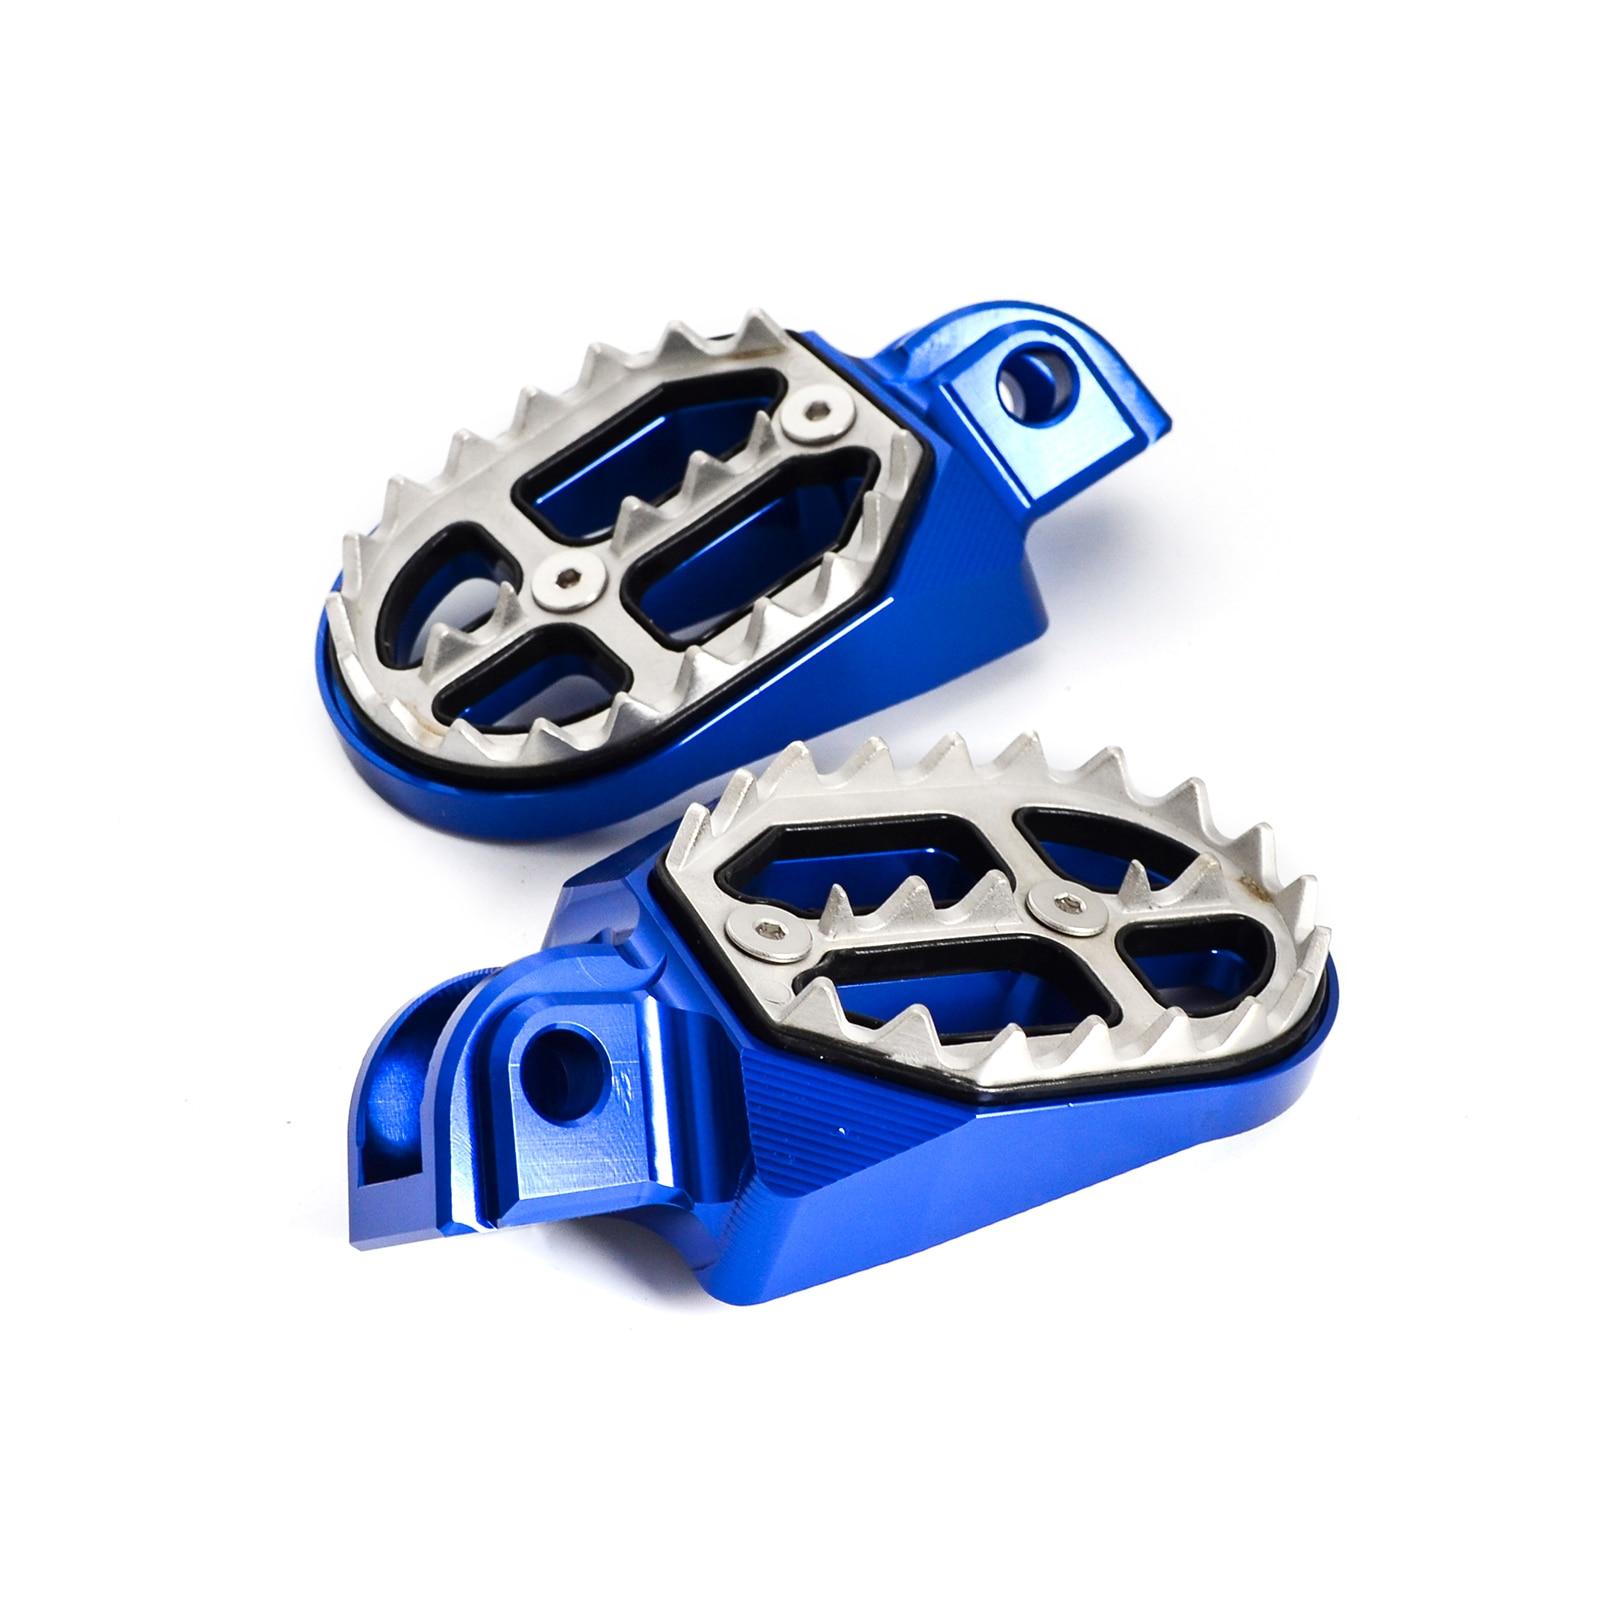 MX Foot Pegs Rests Footrests Footpegs Pedals For Husqvarna TC TE FE FC FX FS 125 250 300 350 390 450 501 510 570 610 2003-2013